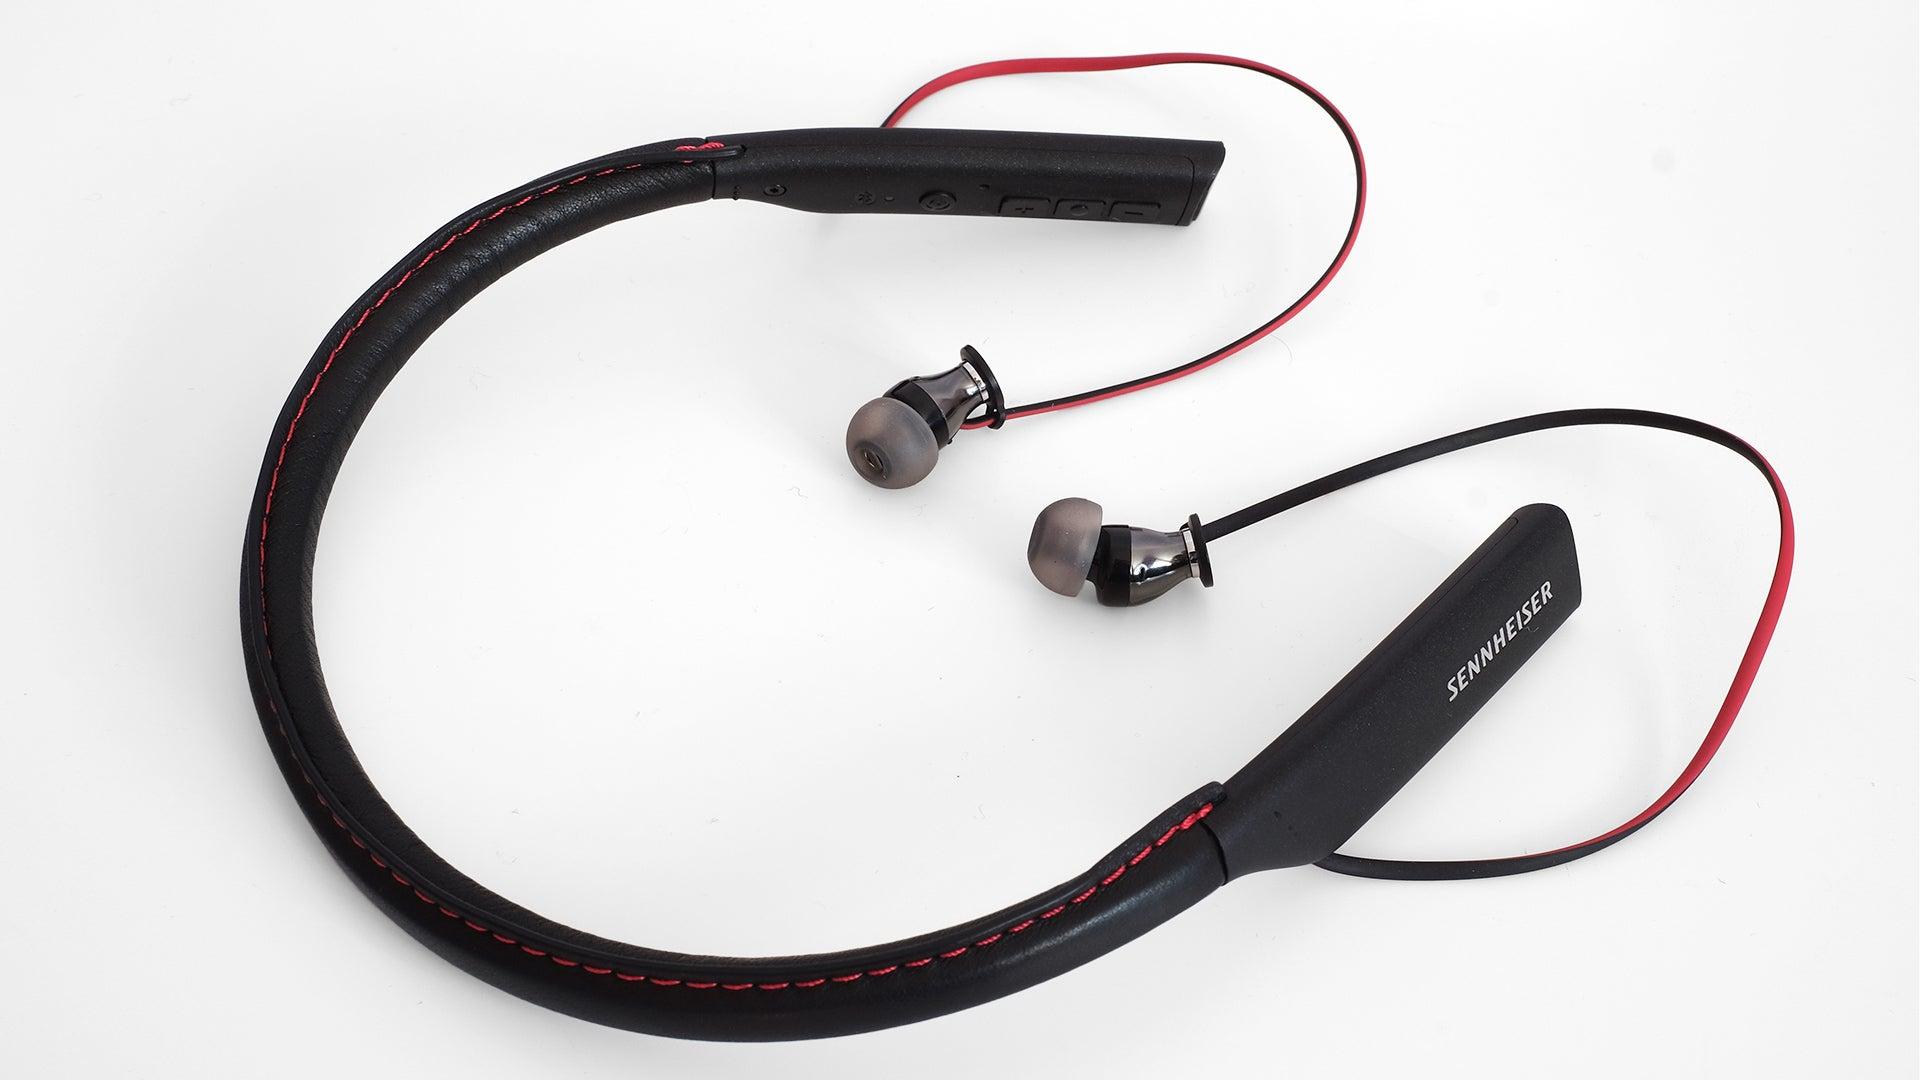 Sennheiser Momentum In Ear Wireless Review Trusted Reviews Headphone Hd 440 Bt